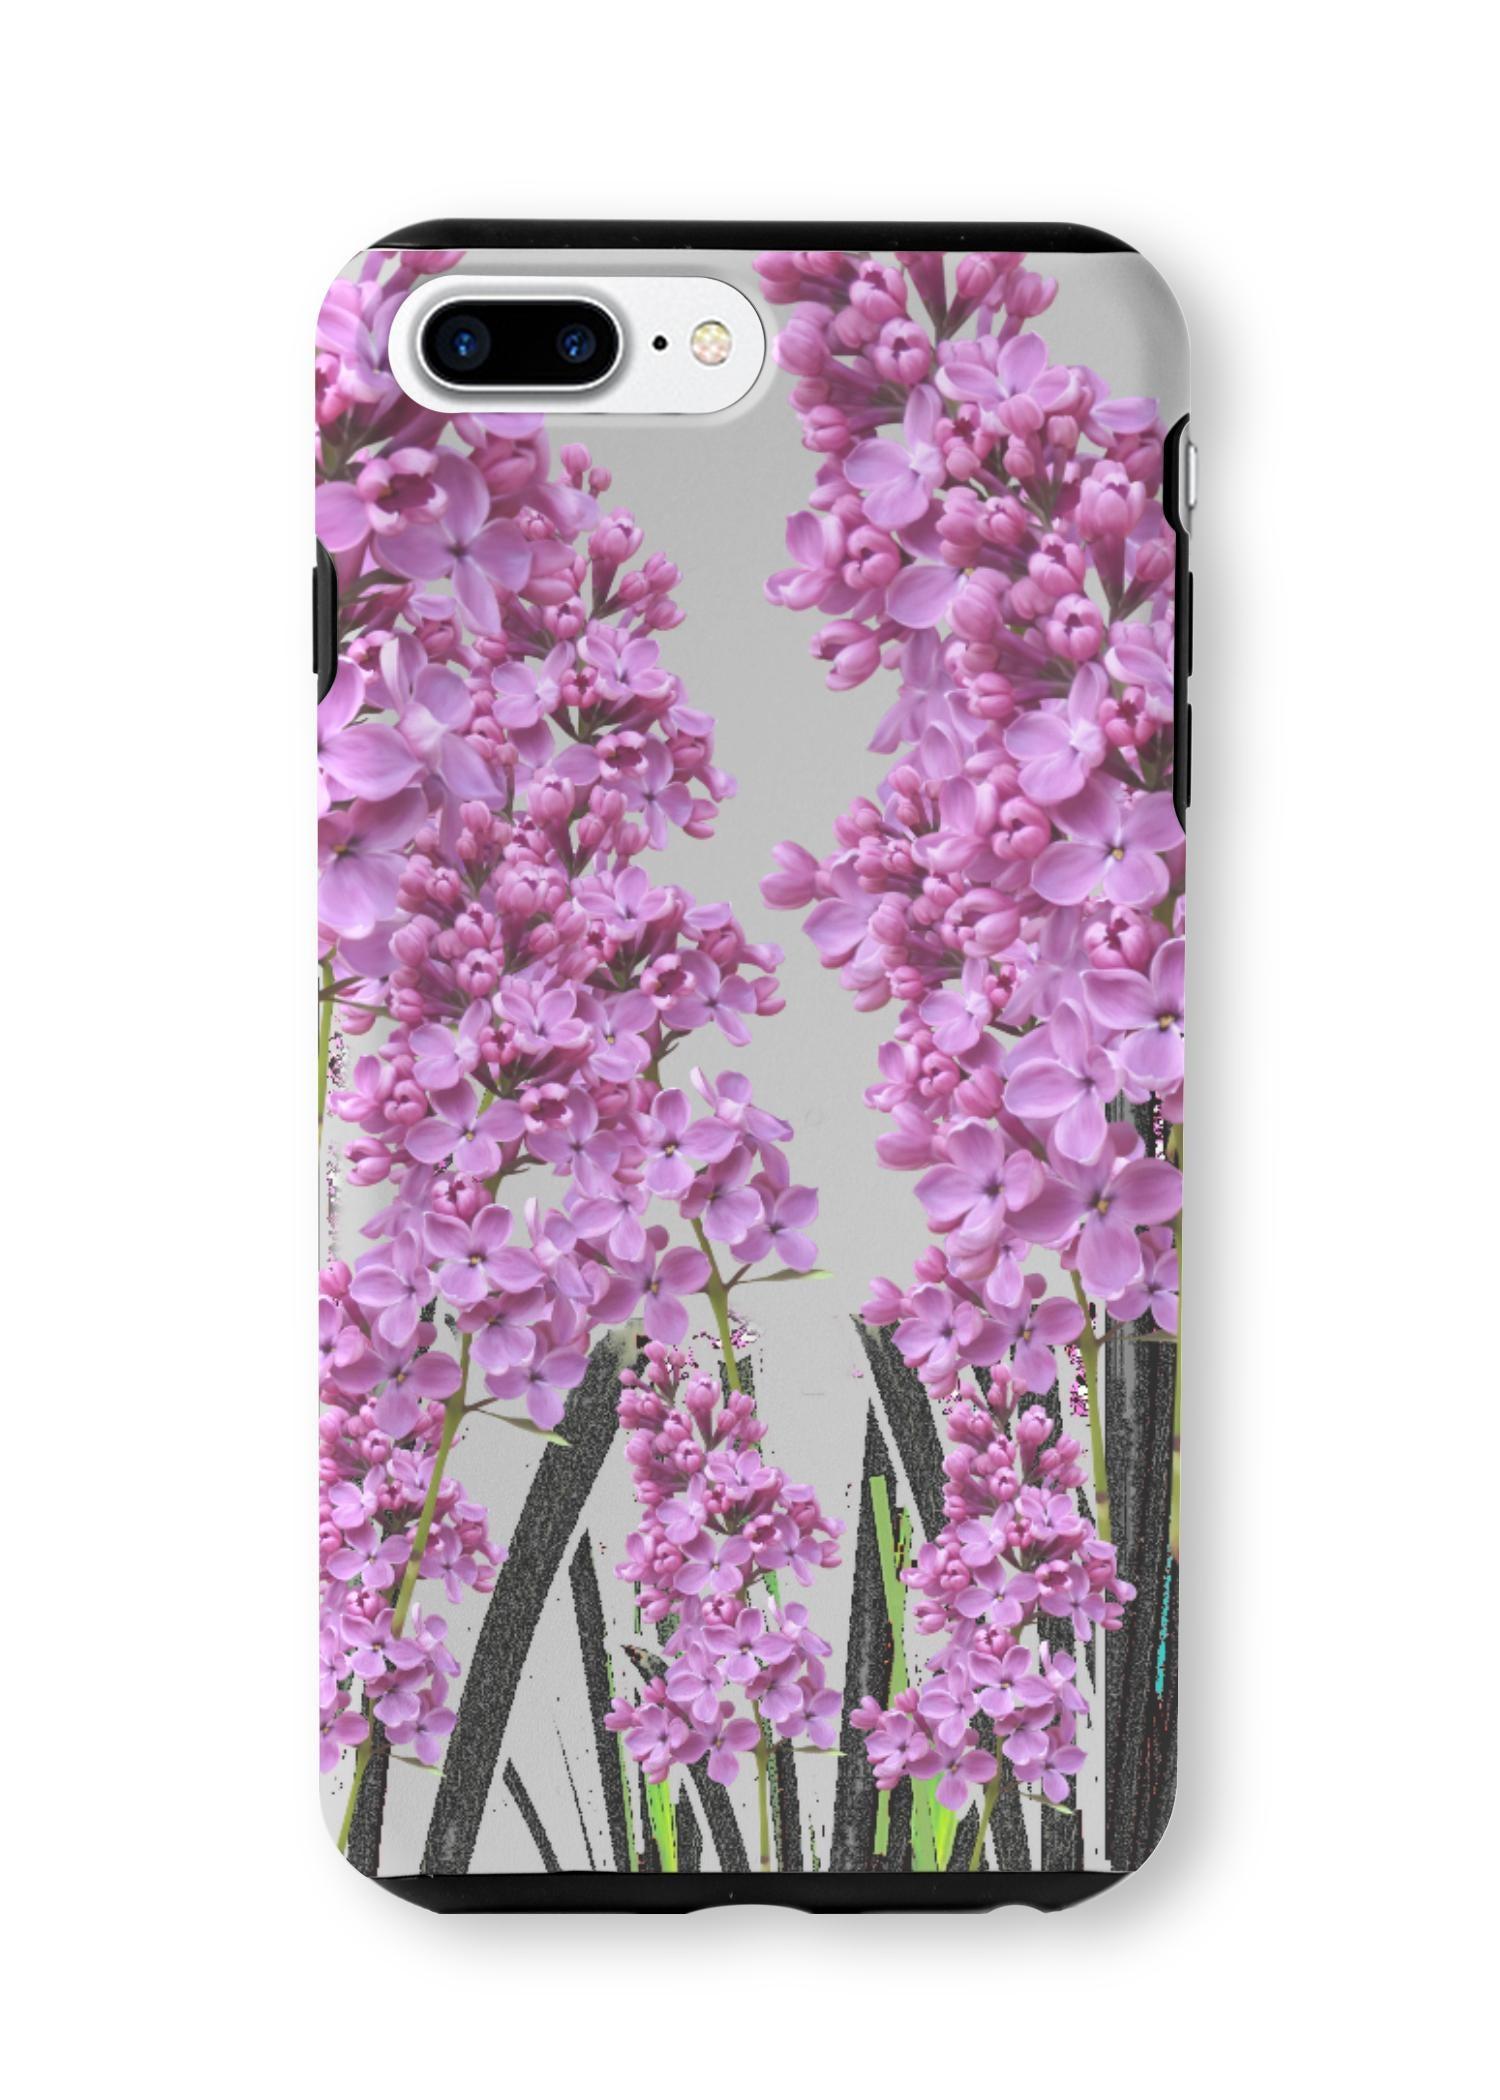 VIDA iPhone Case - Spring Purple Garden Art by VIDA Original Artist  - Size: iPhone 7/8 PLUS / Tough